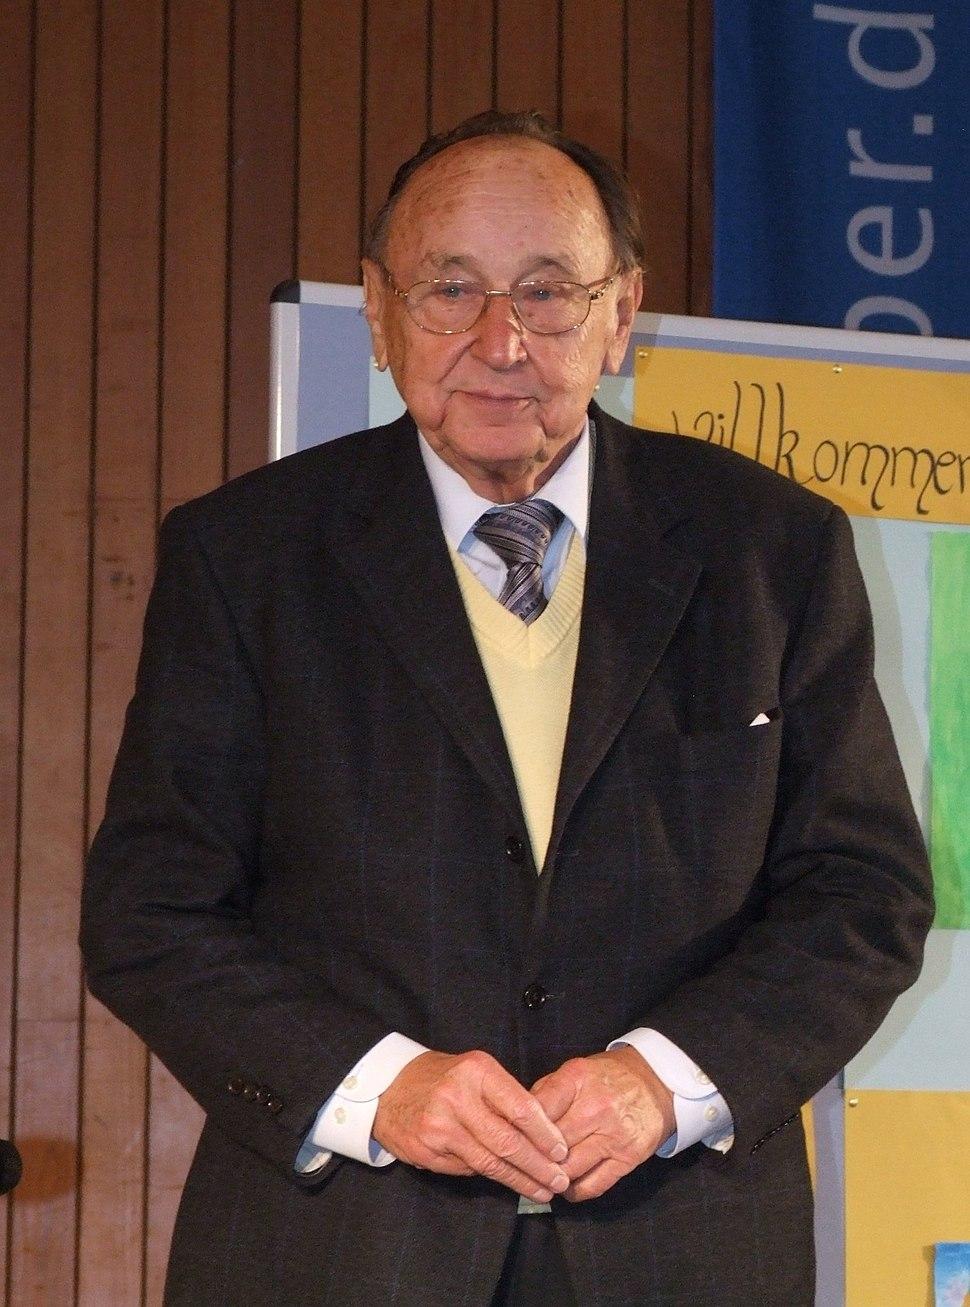 Hans-Dietrich Genscher Dezember 2007 CJD Koenigswinter 2